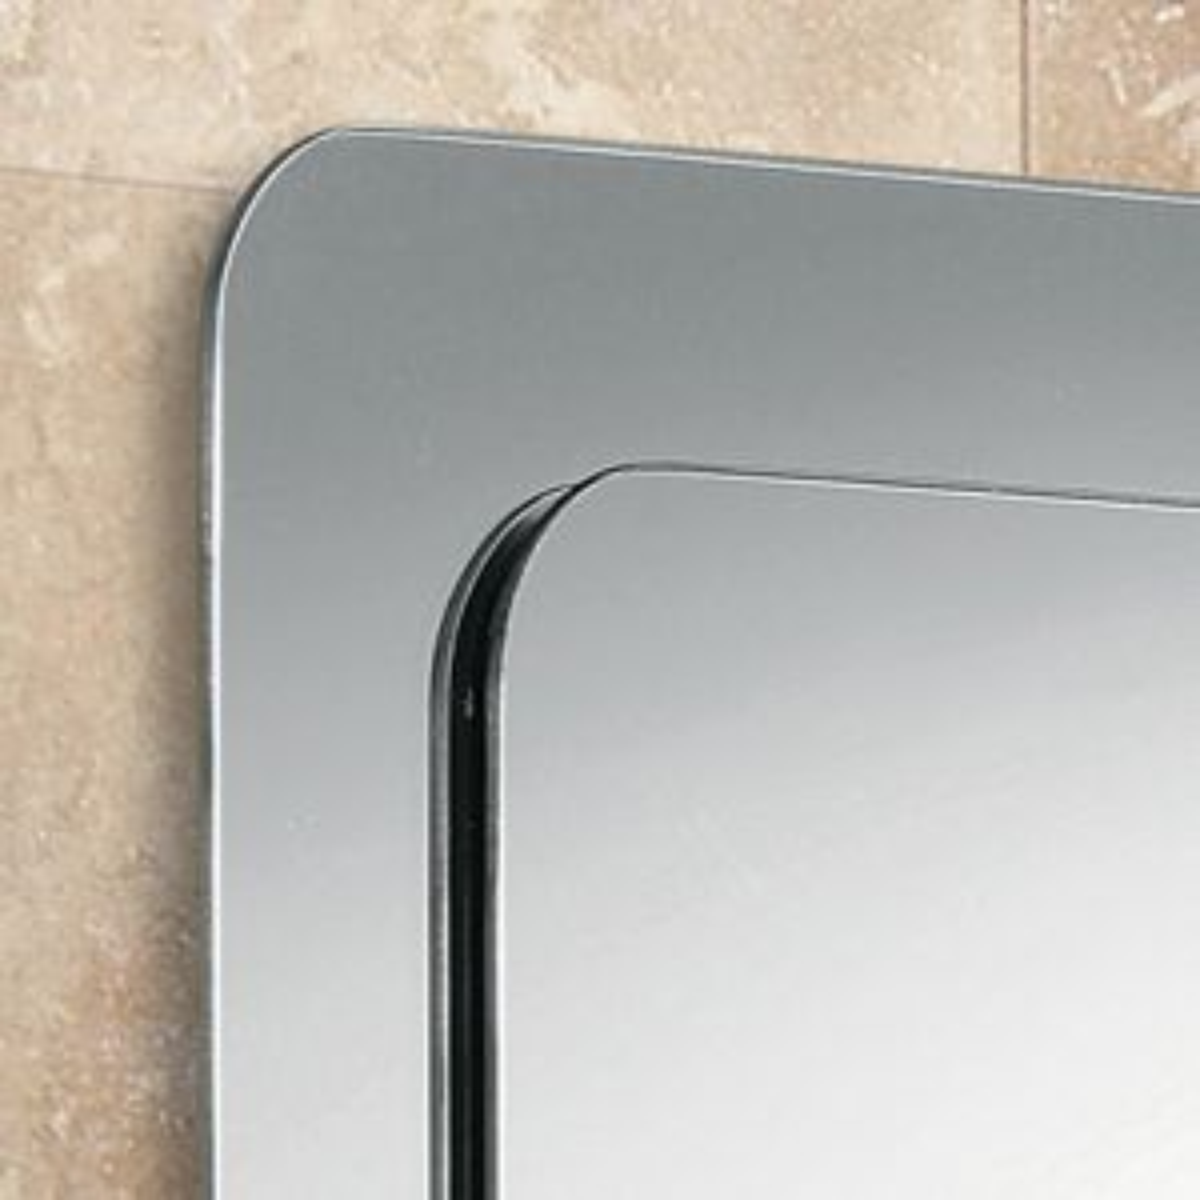 Almo Bathroom Mirror Detail